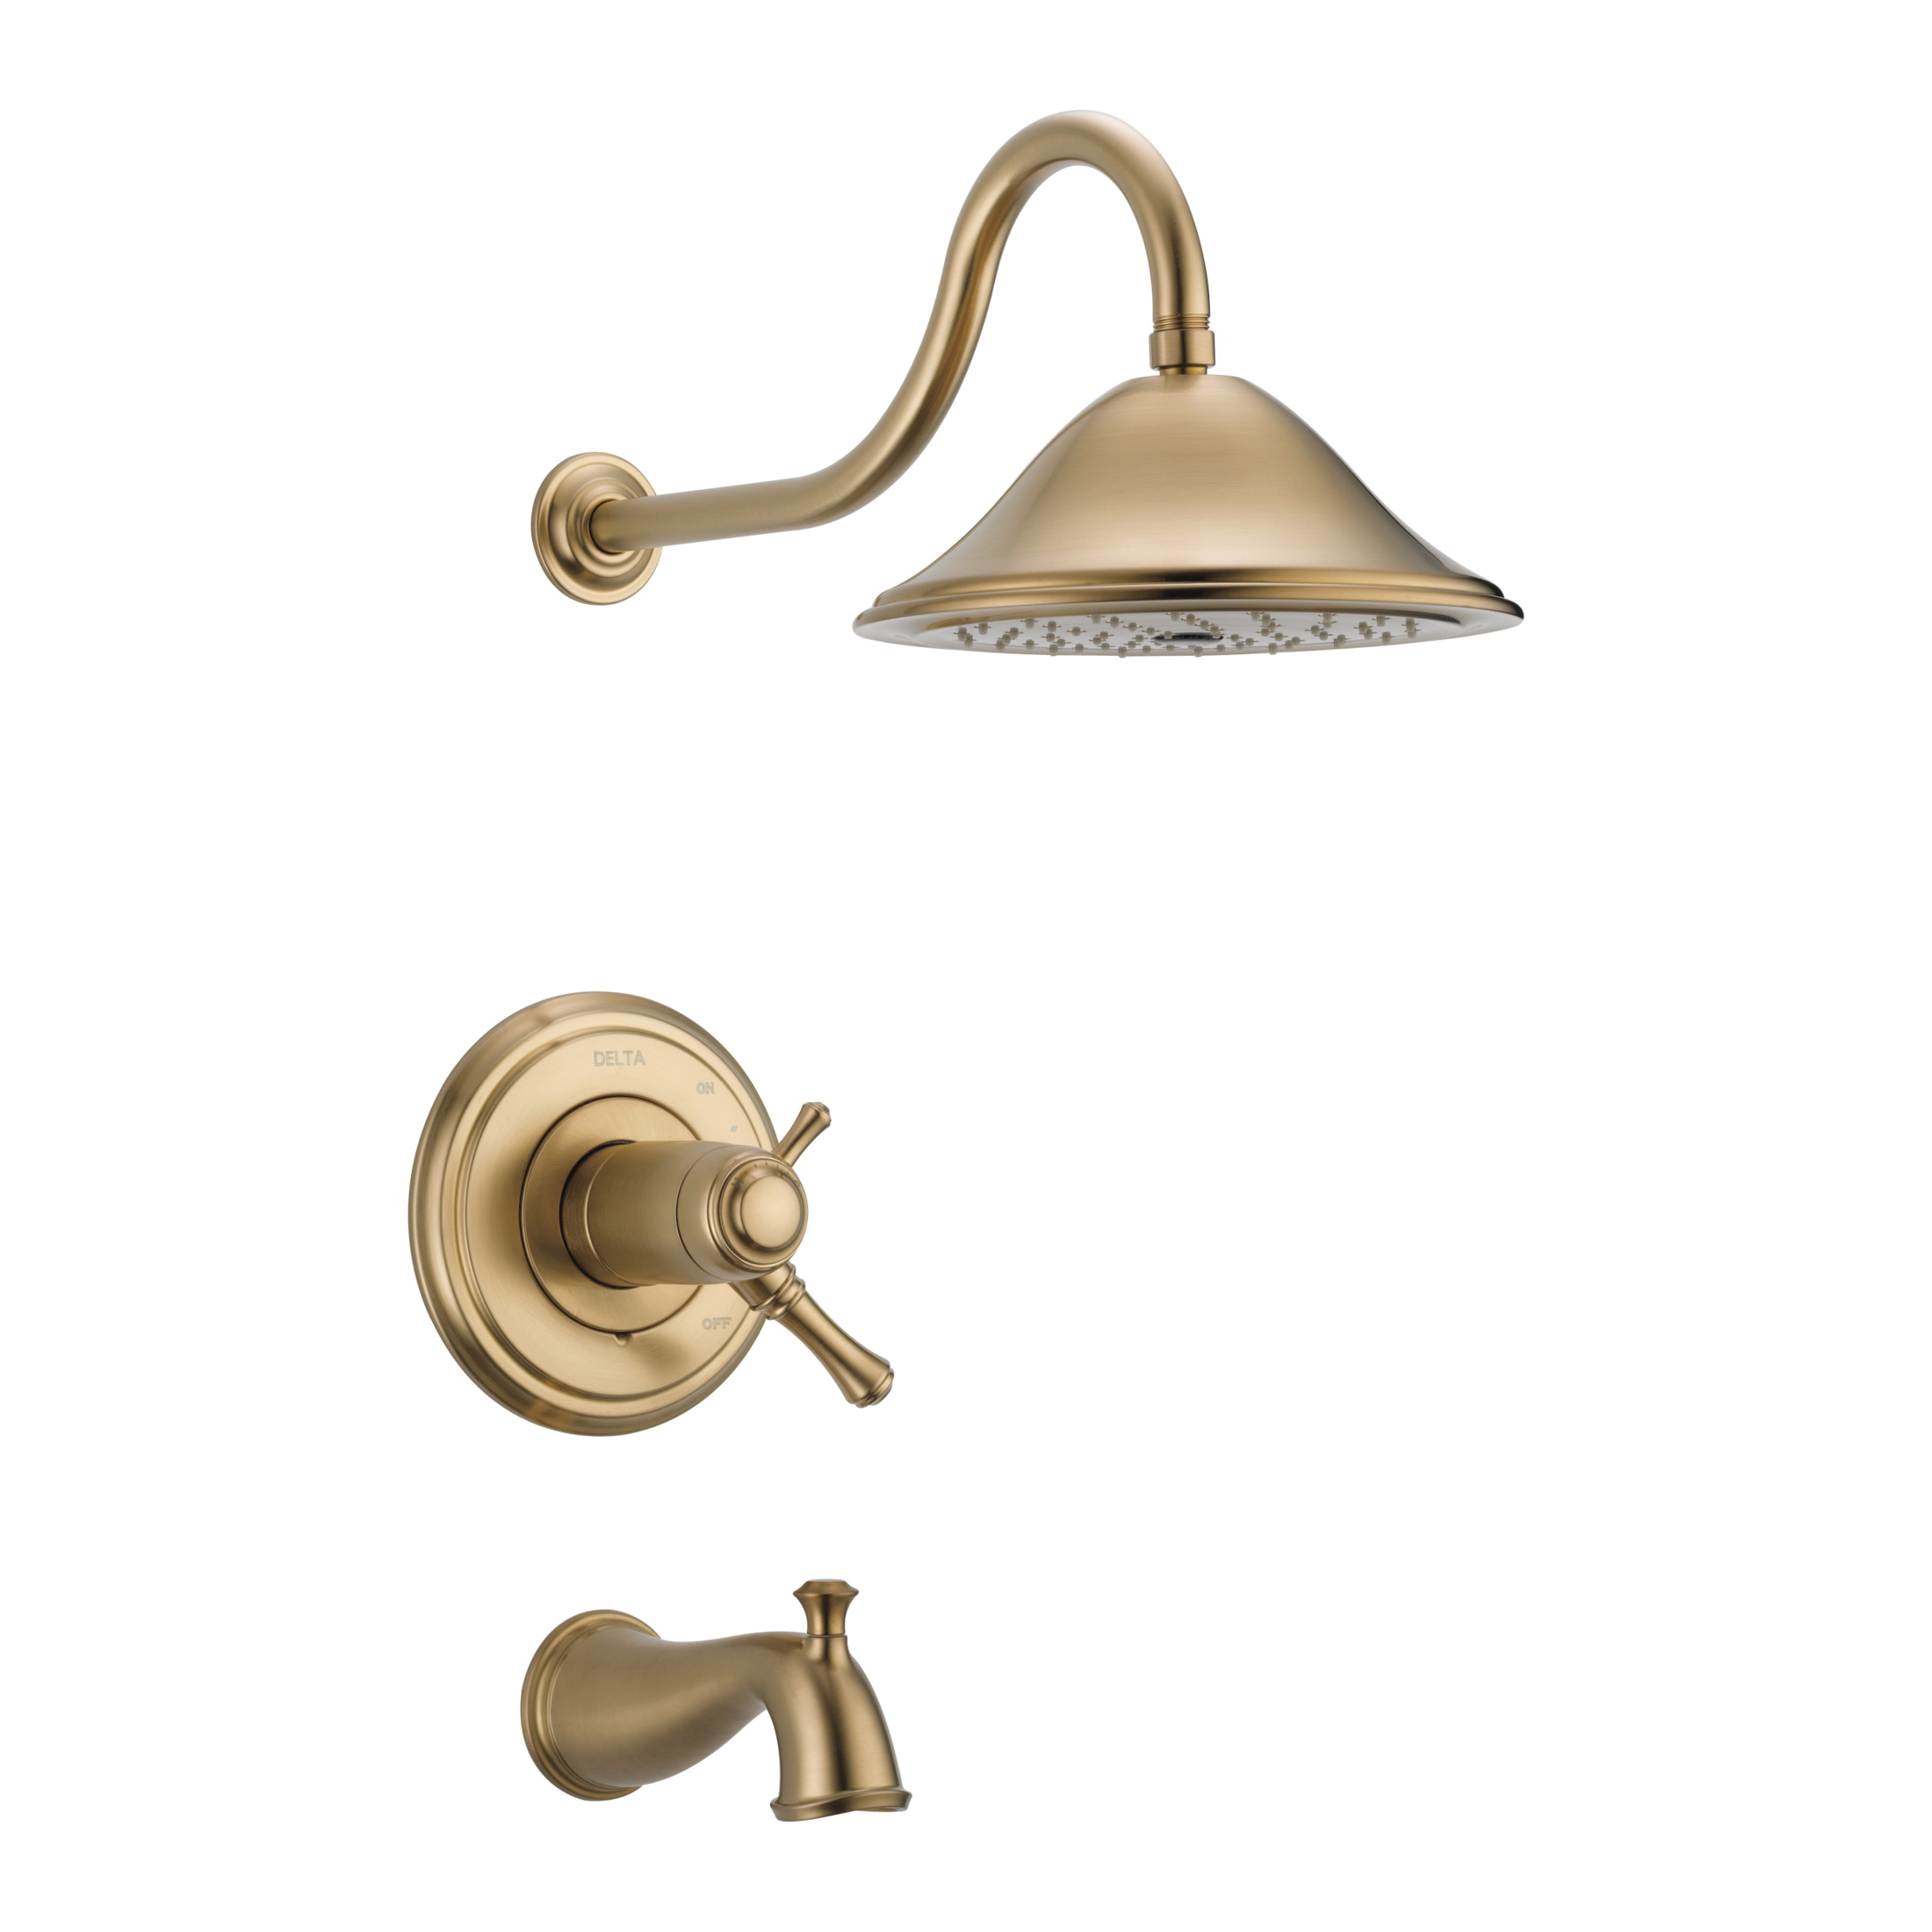 DELTA® T17T497-CZ TempAssure® 17T Tub and Shower Trim, 2.5 gpm Shower, Hand Shower Yes/No: No, Brilliance® Champagne Bronze